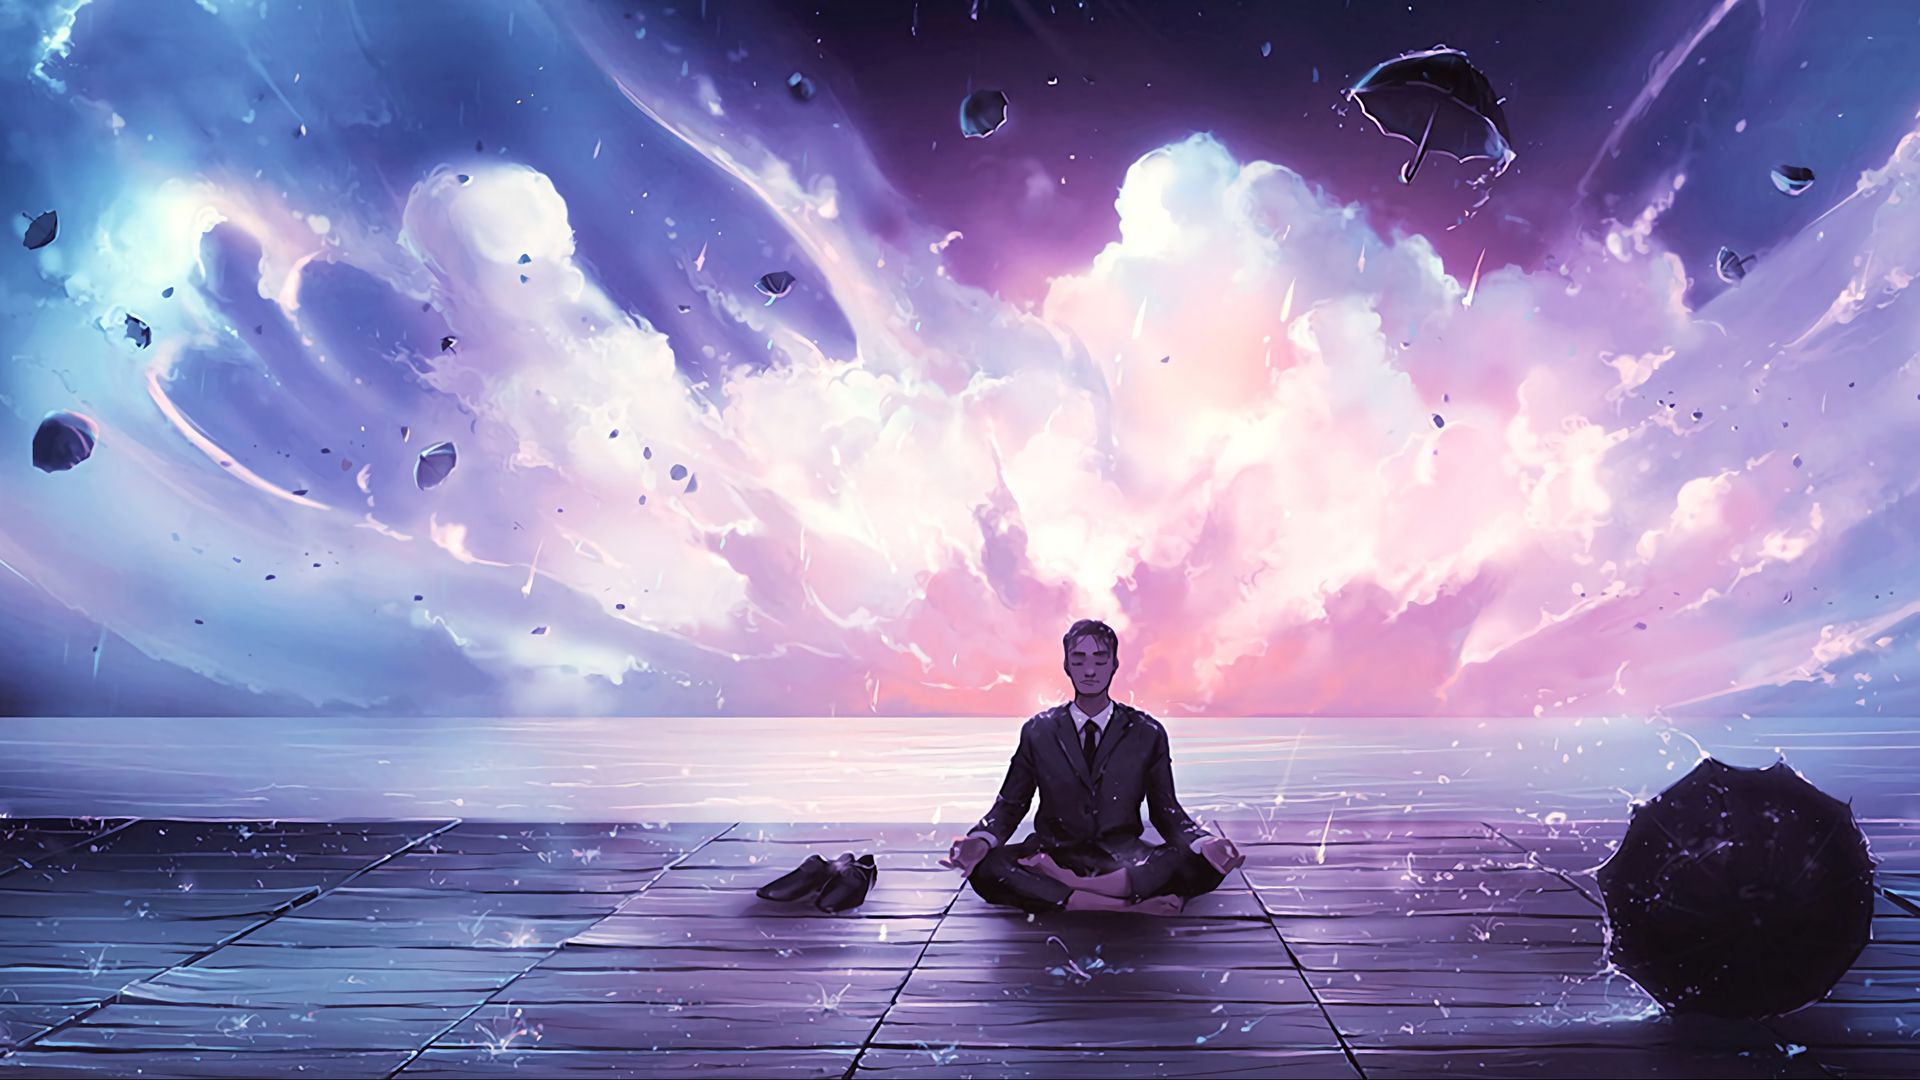 1920x1080 Wallpaper meditation, calmness, harmony, art, man, rain, eureka